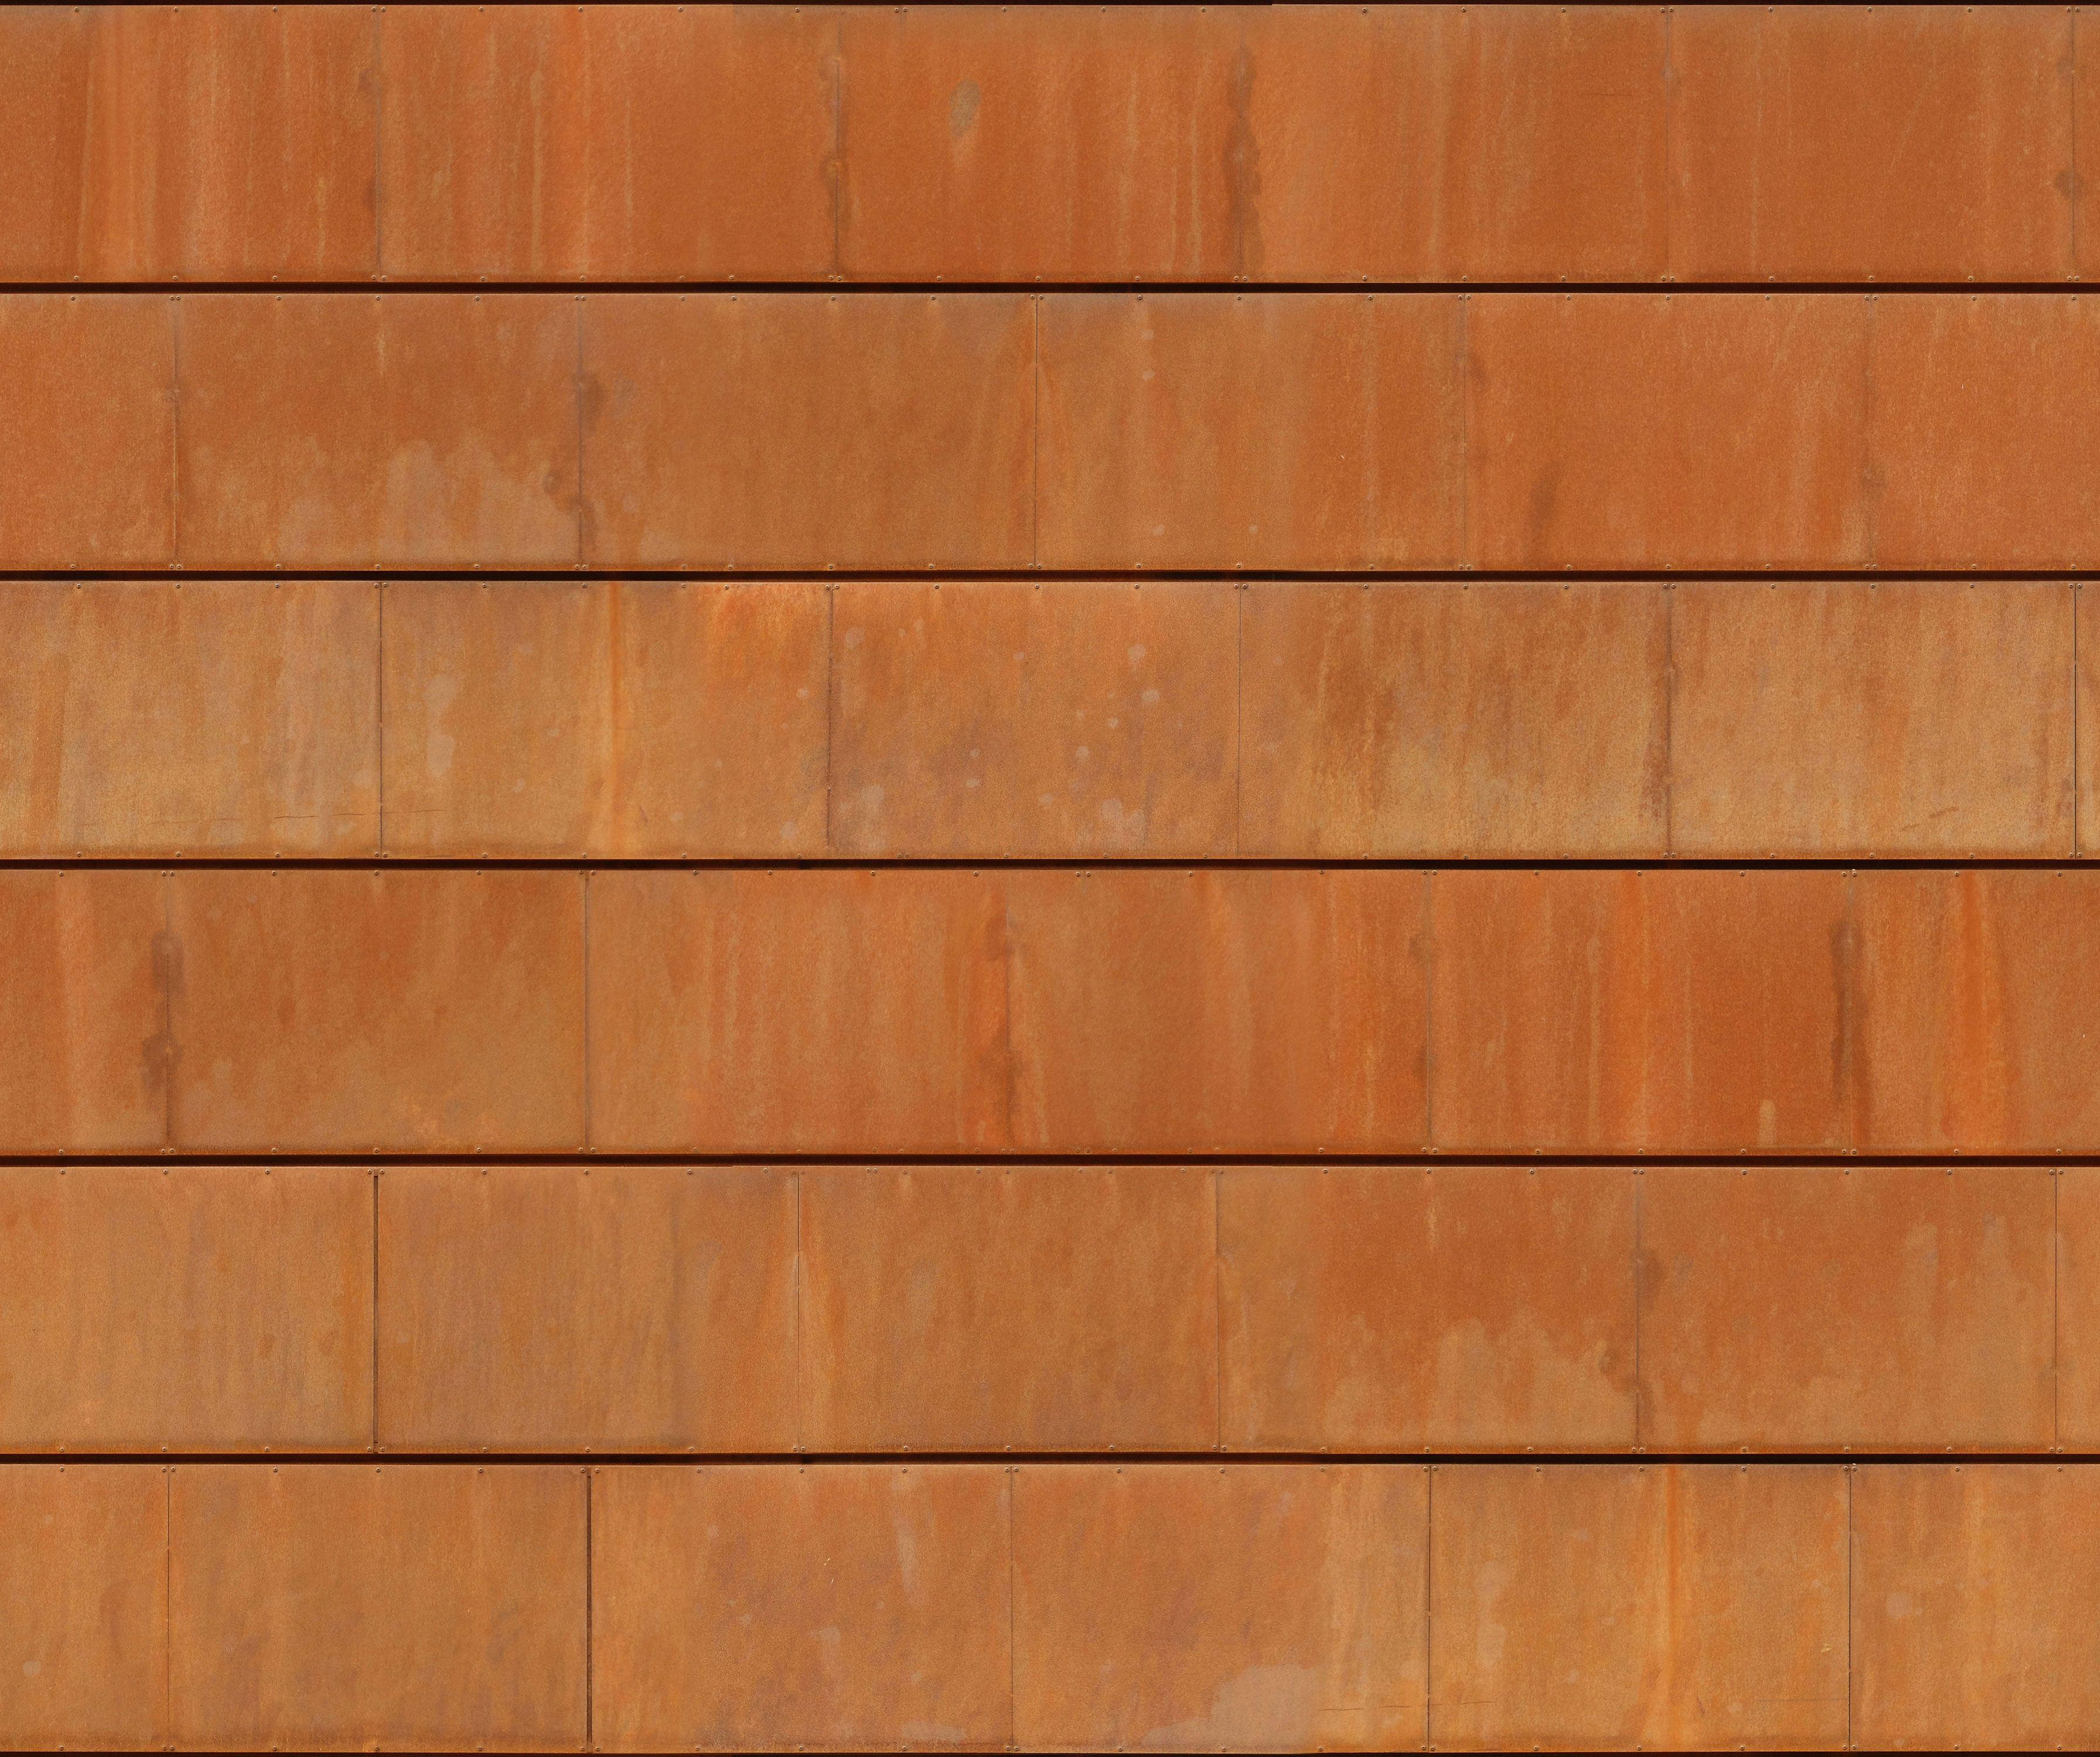 Rain Or Shine Paint For Wood